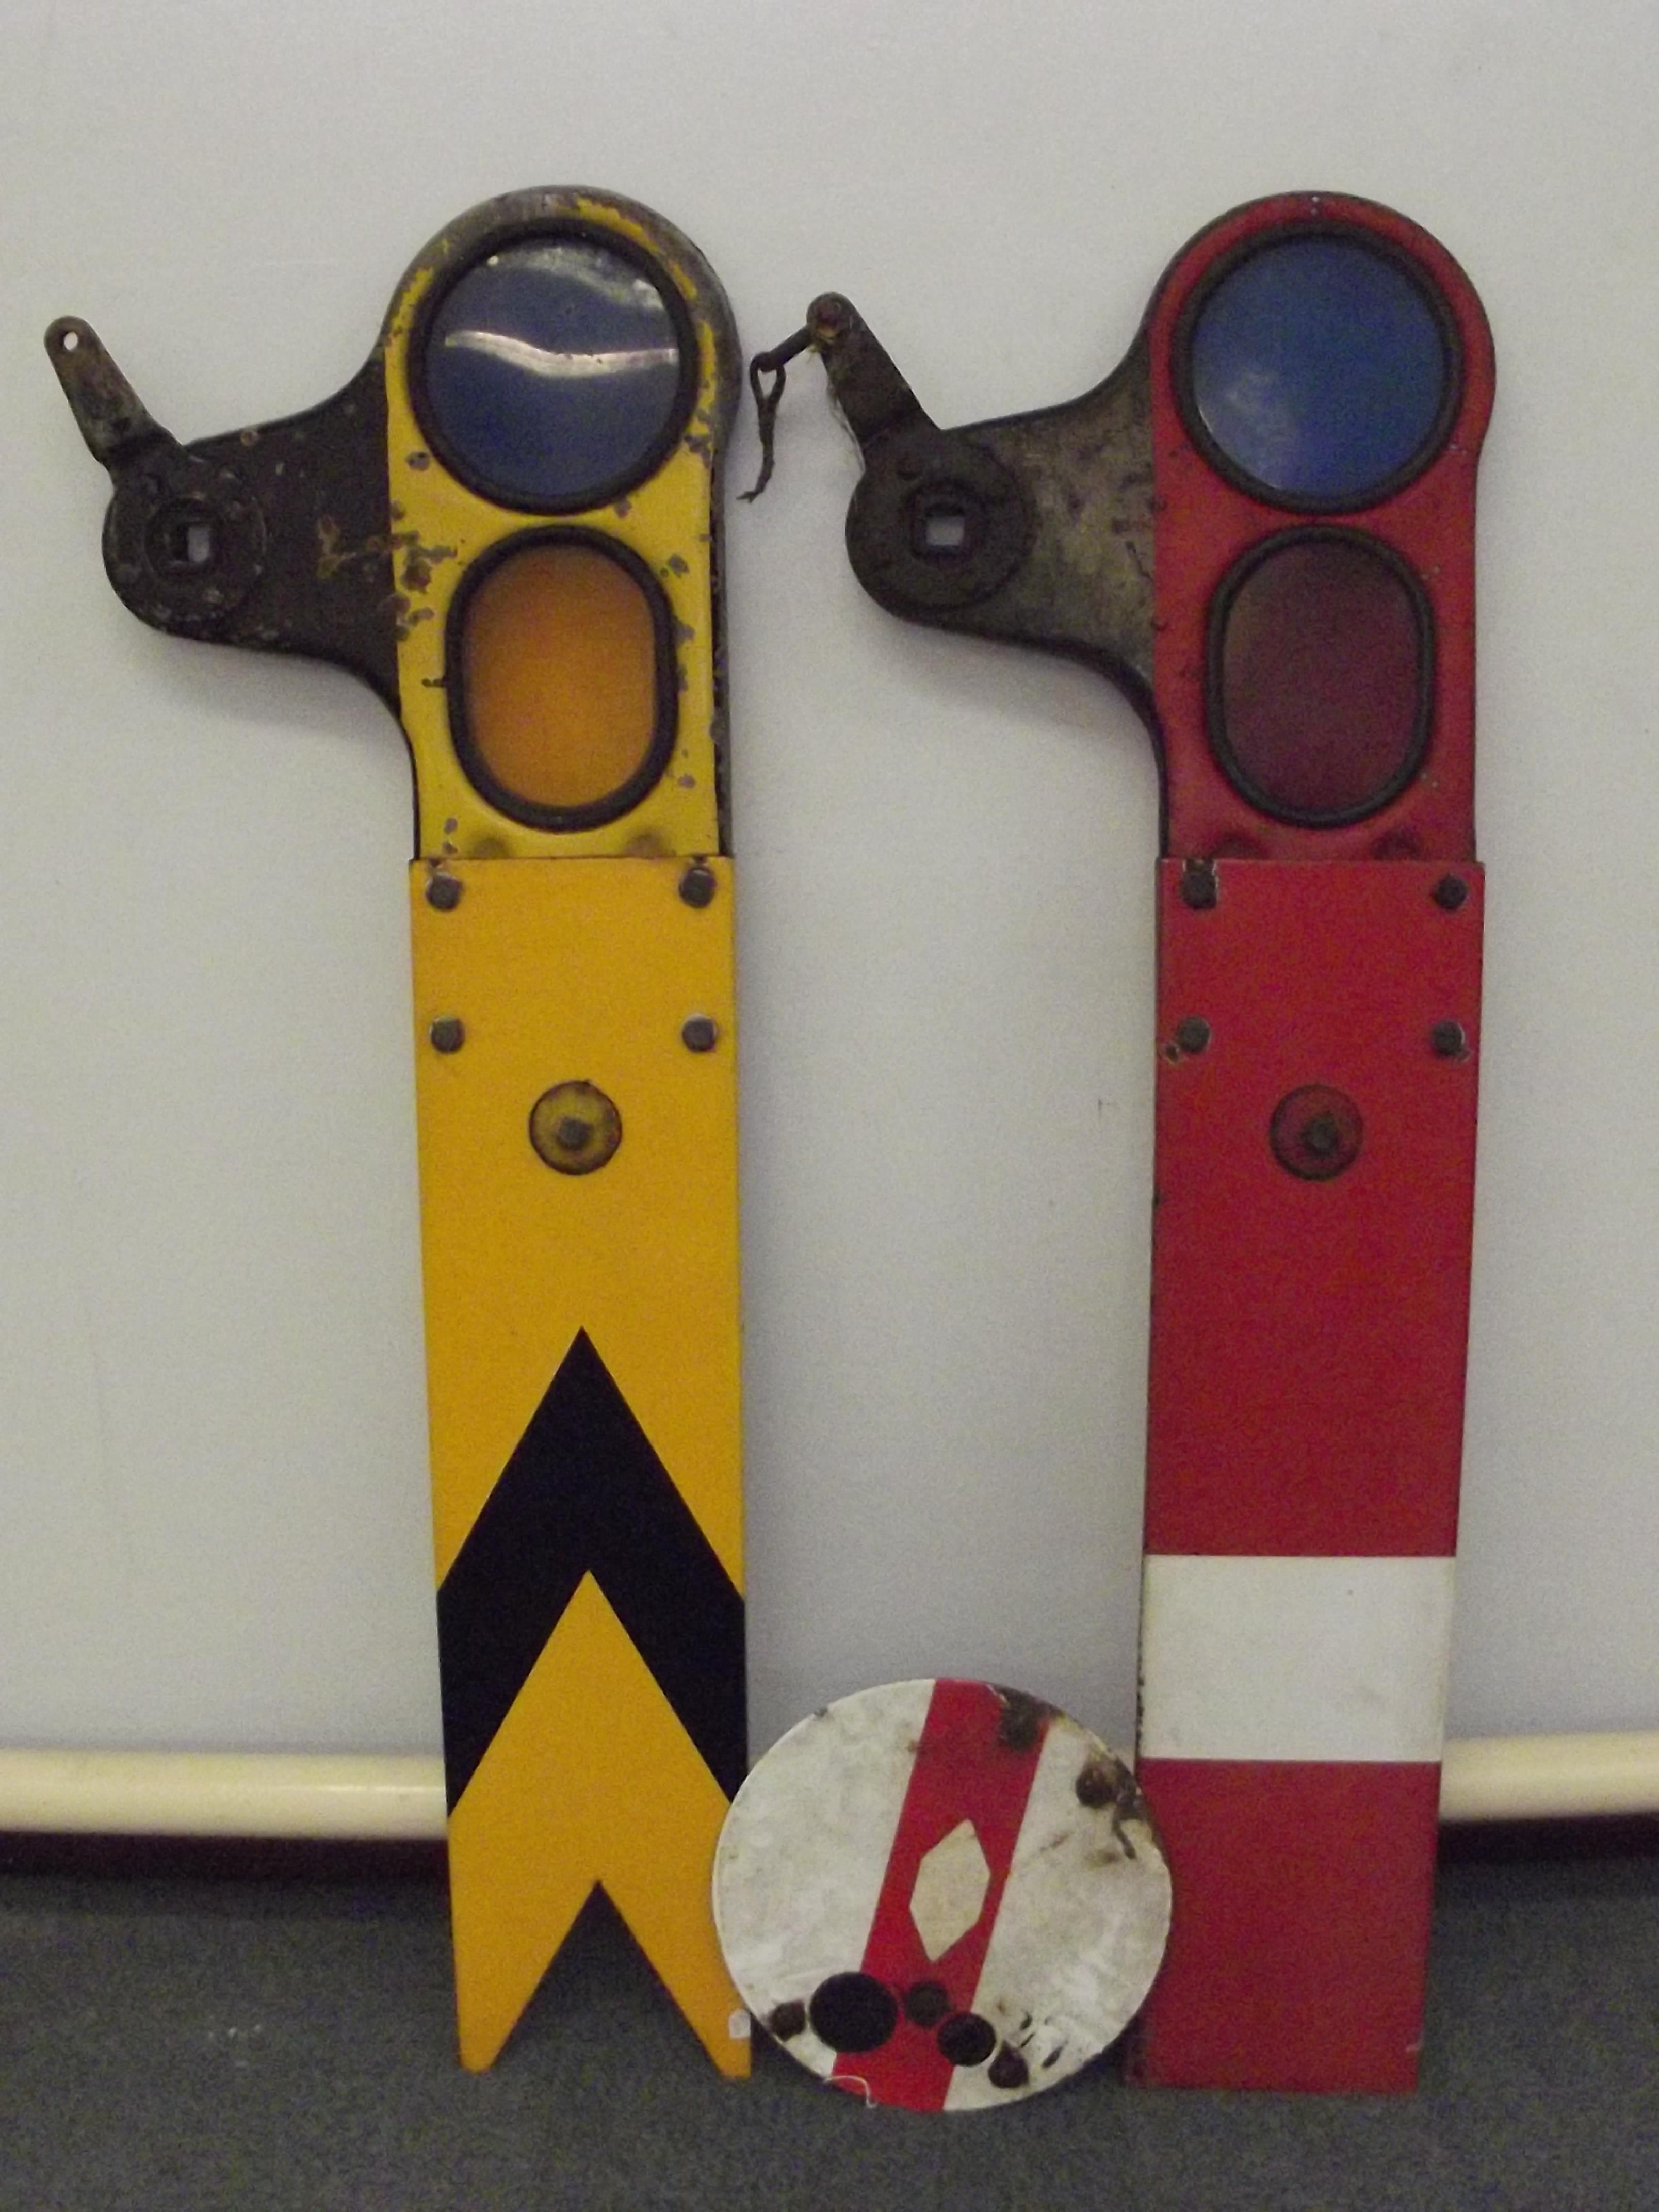 British rail (BR) railway semaphore signals, yellow distance signal